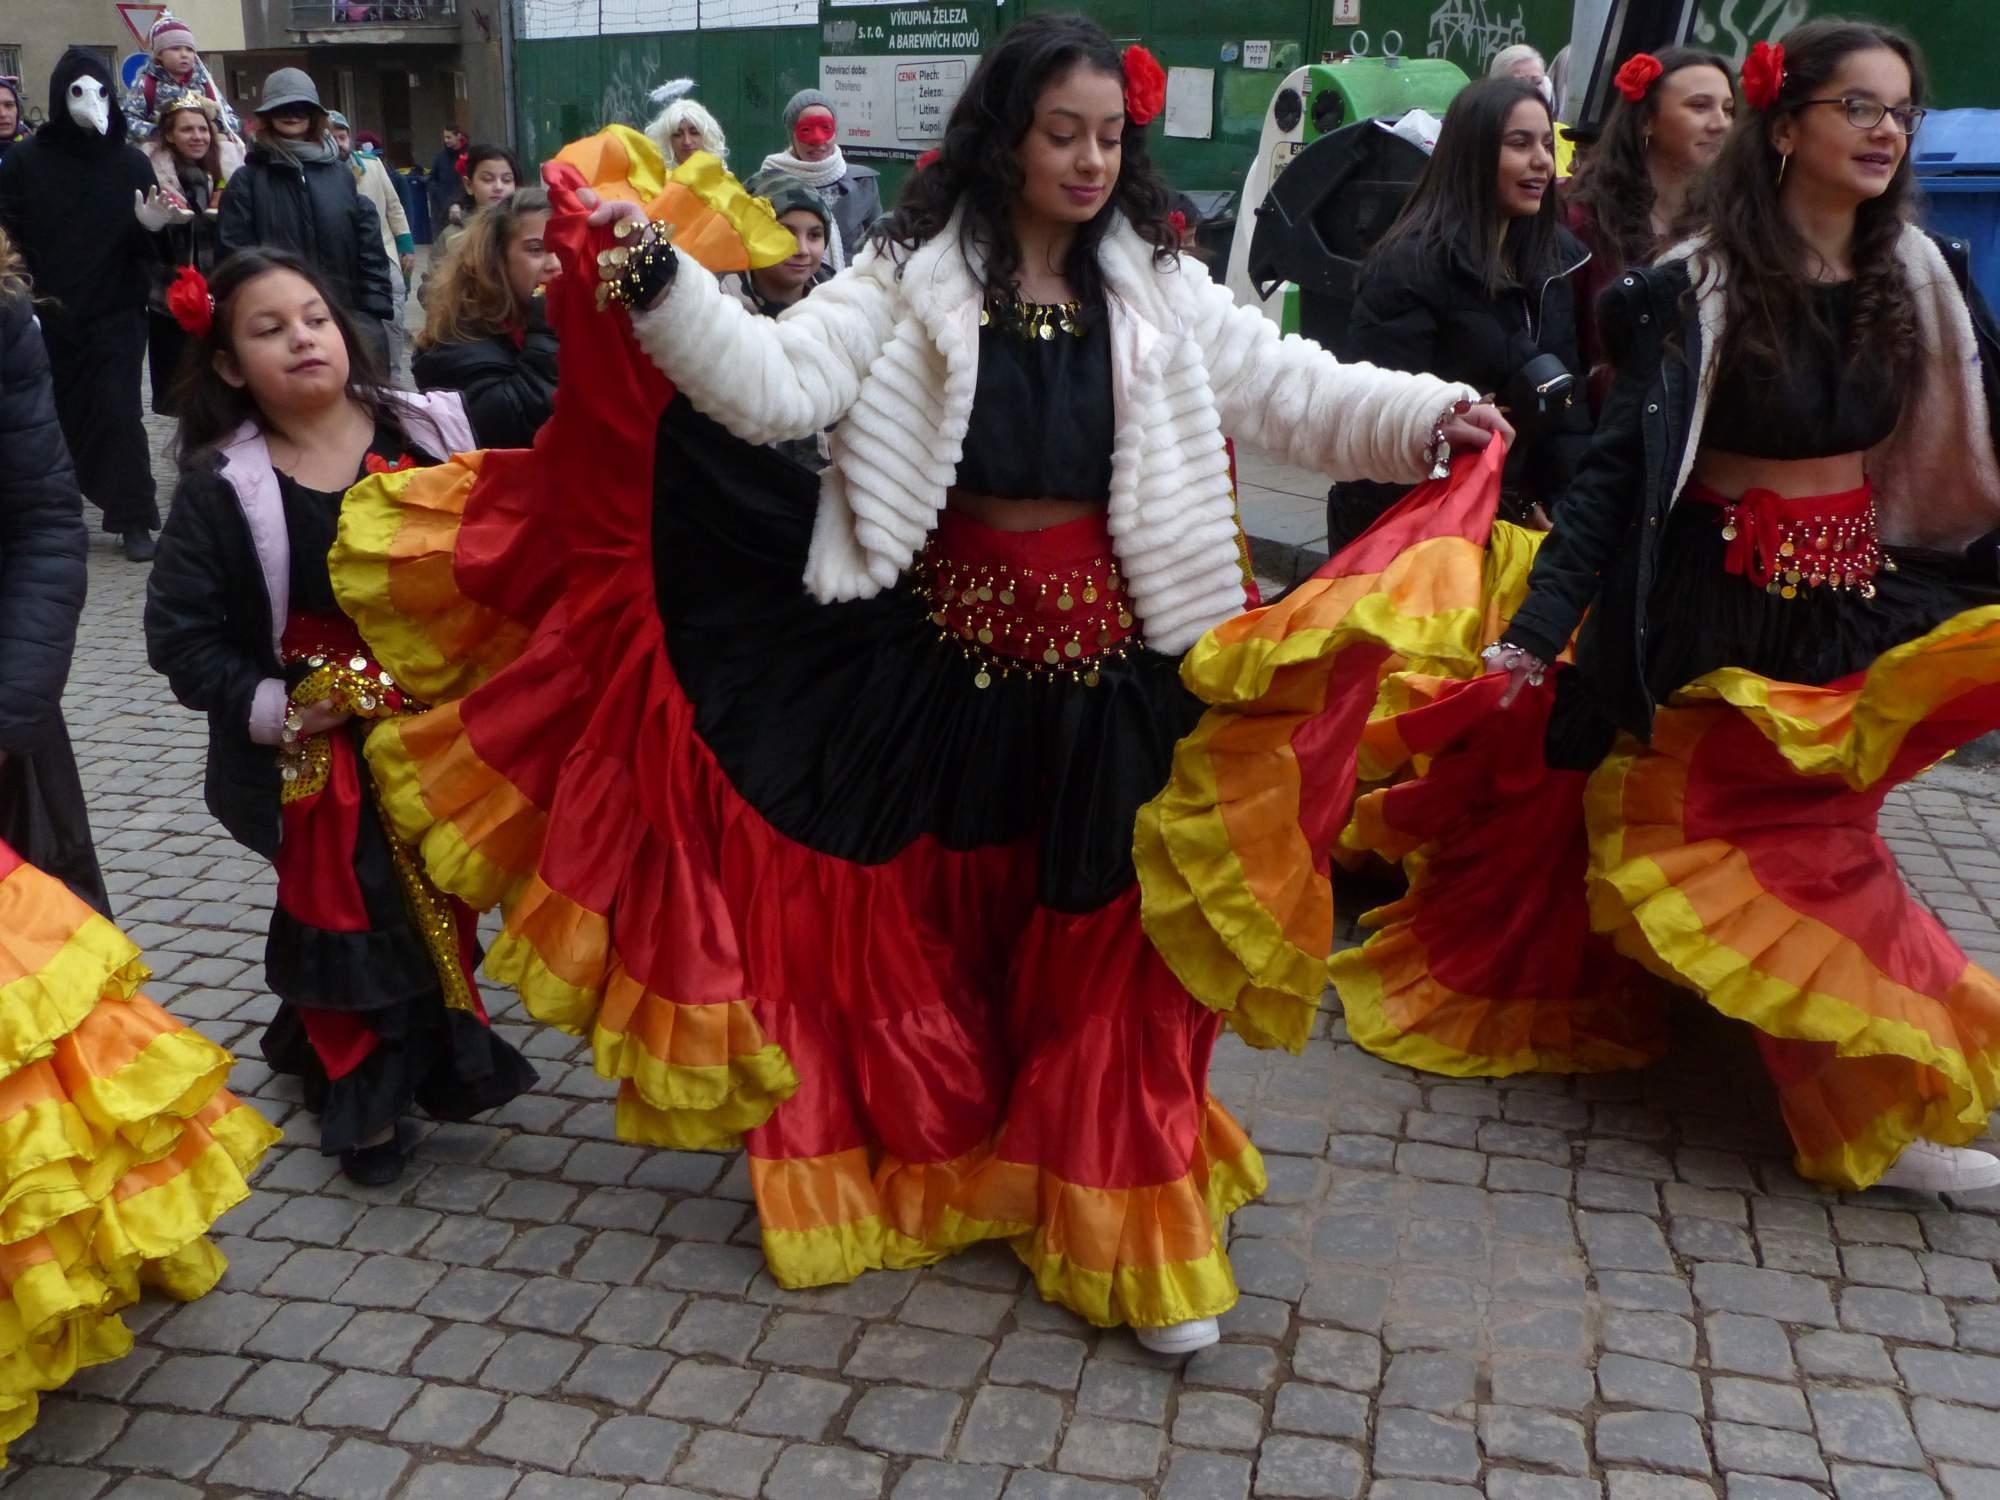 Ozdobou průvodu byly pestrobarevné šaty tanečnic. Foto: Martin Foral